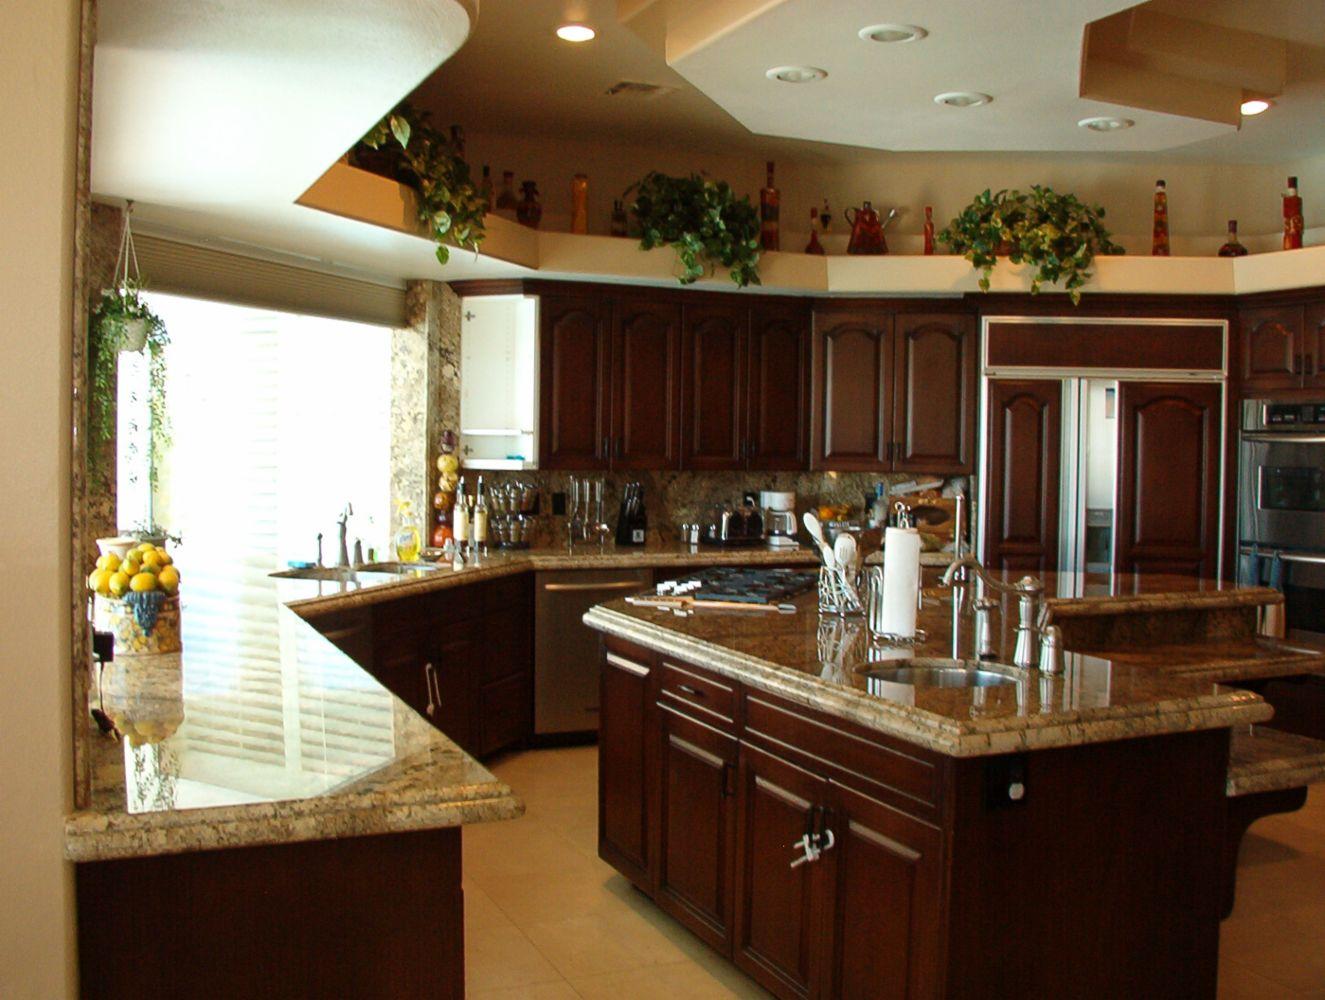 Kitchen and bathroom remodeling in las vegas nv mc mojave for Bath remodel vegas